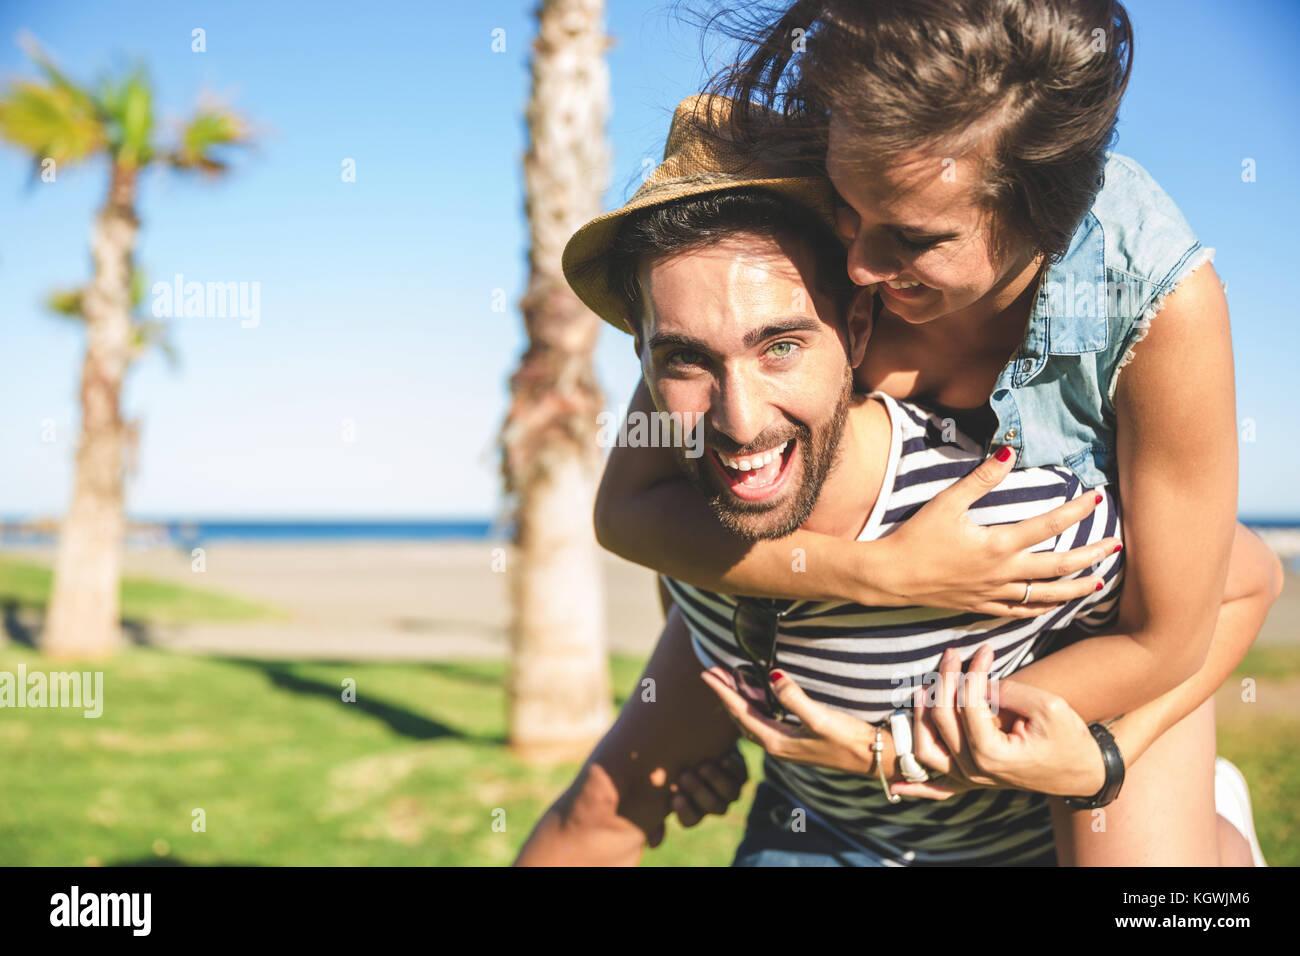 Portrait of happy man giving his girlfriend piggyback ride Photo Stock